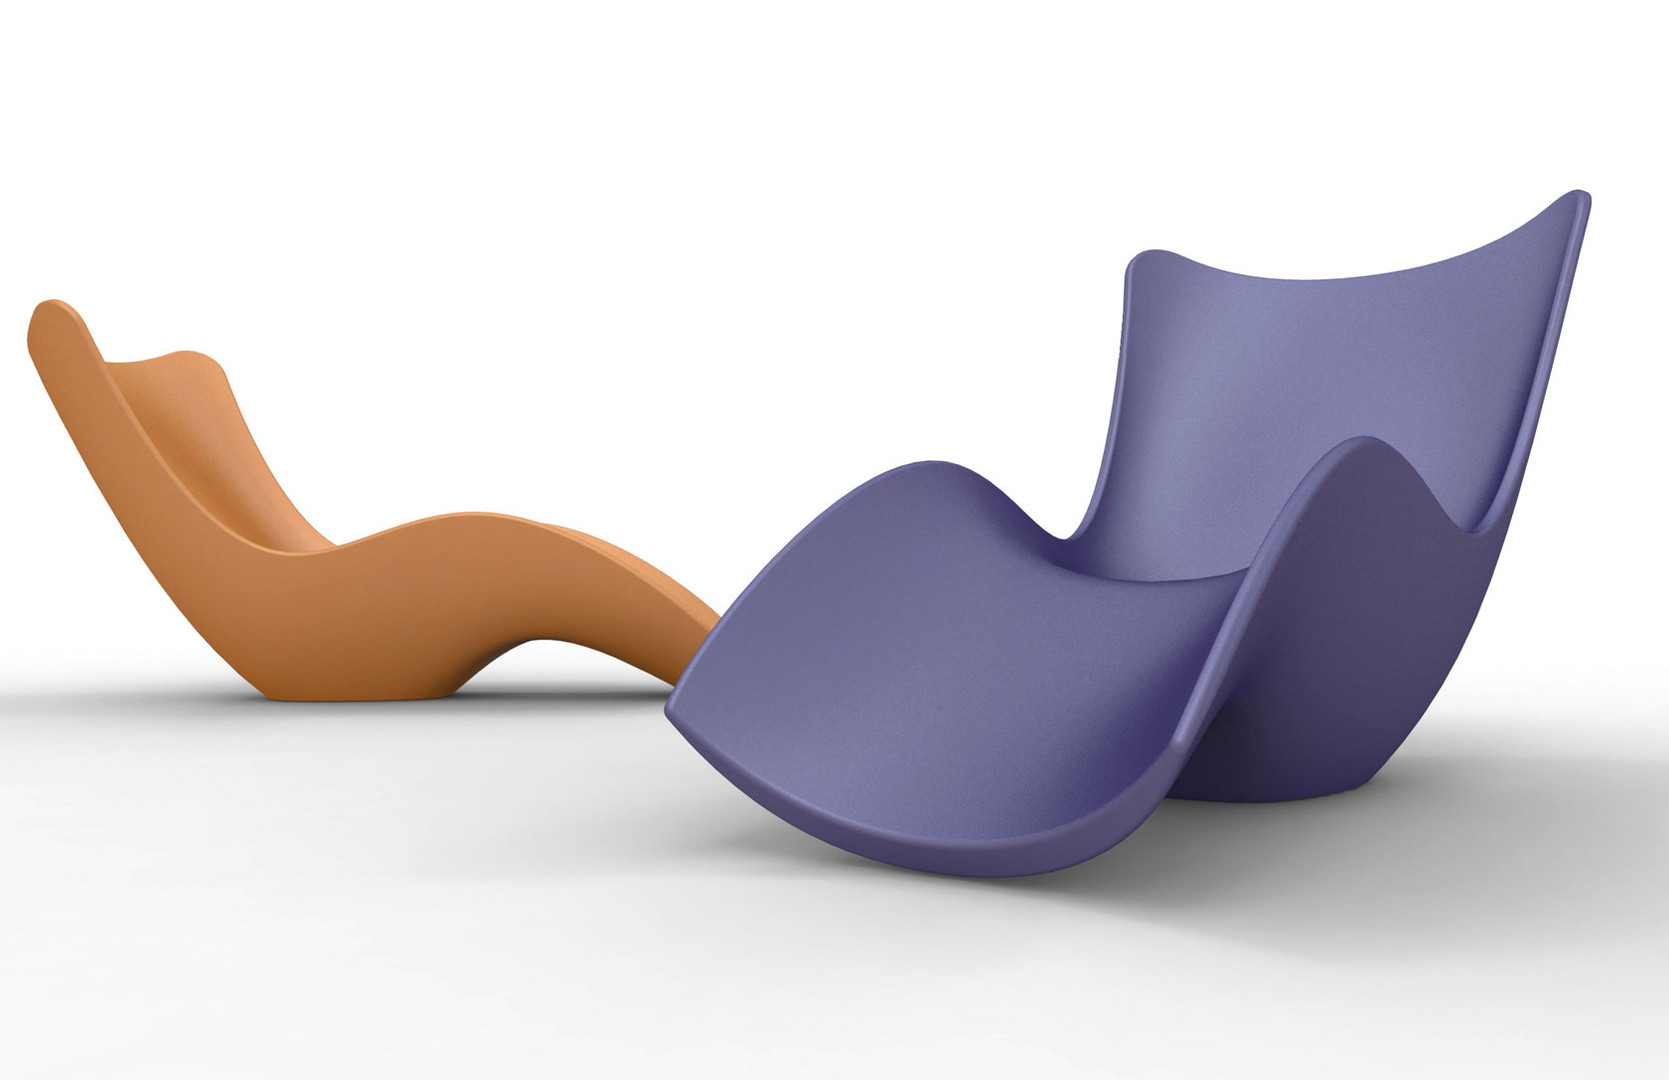 SURF_chaise-longue_by_Karim_for_VONDOM.j